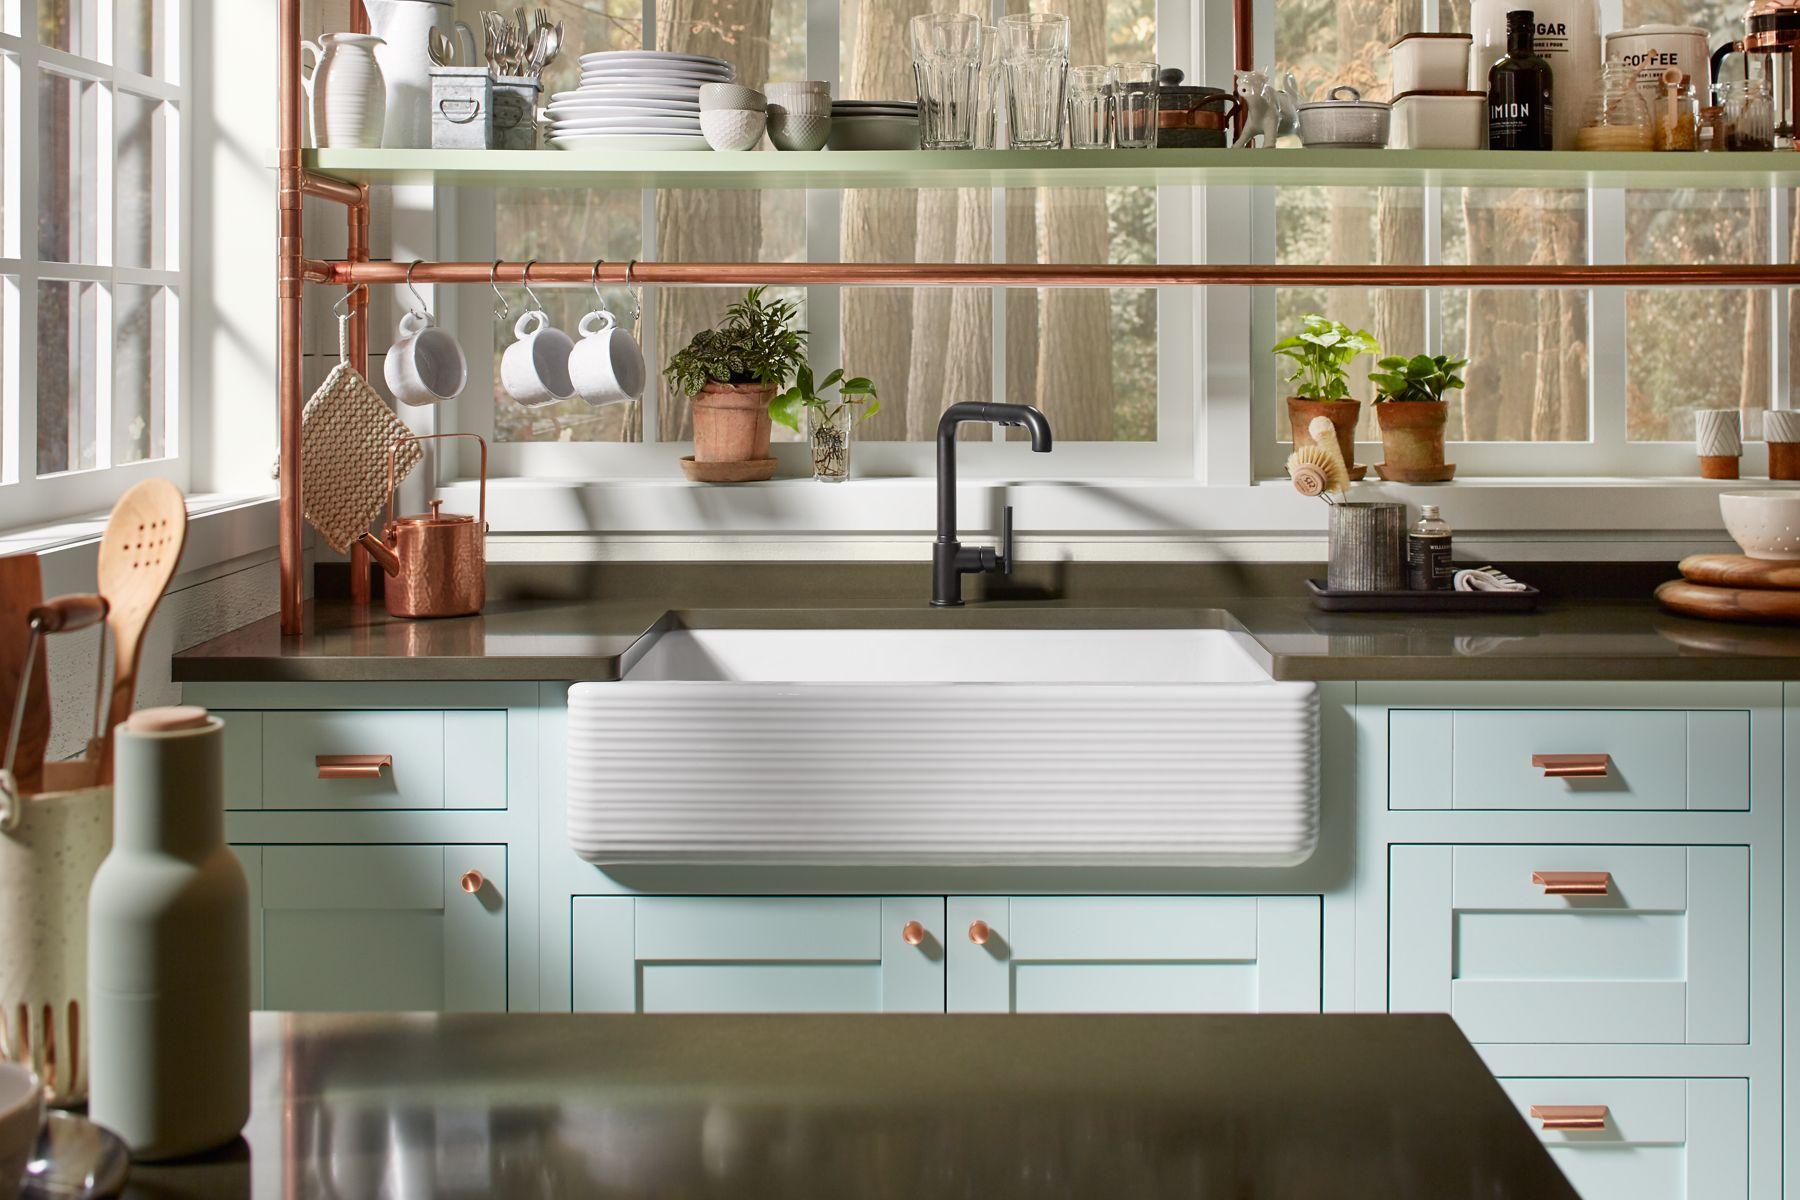 White apron sink ontario - White Apron Sink Ontario 57